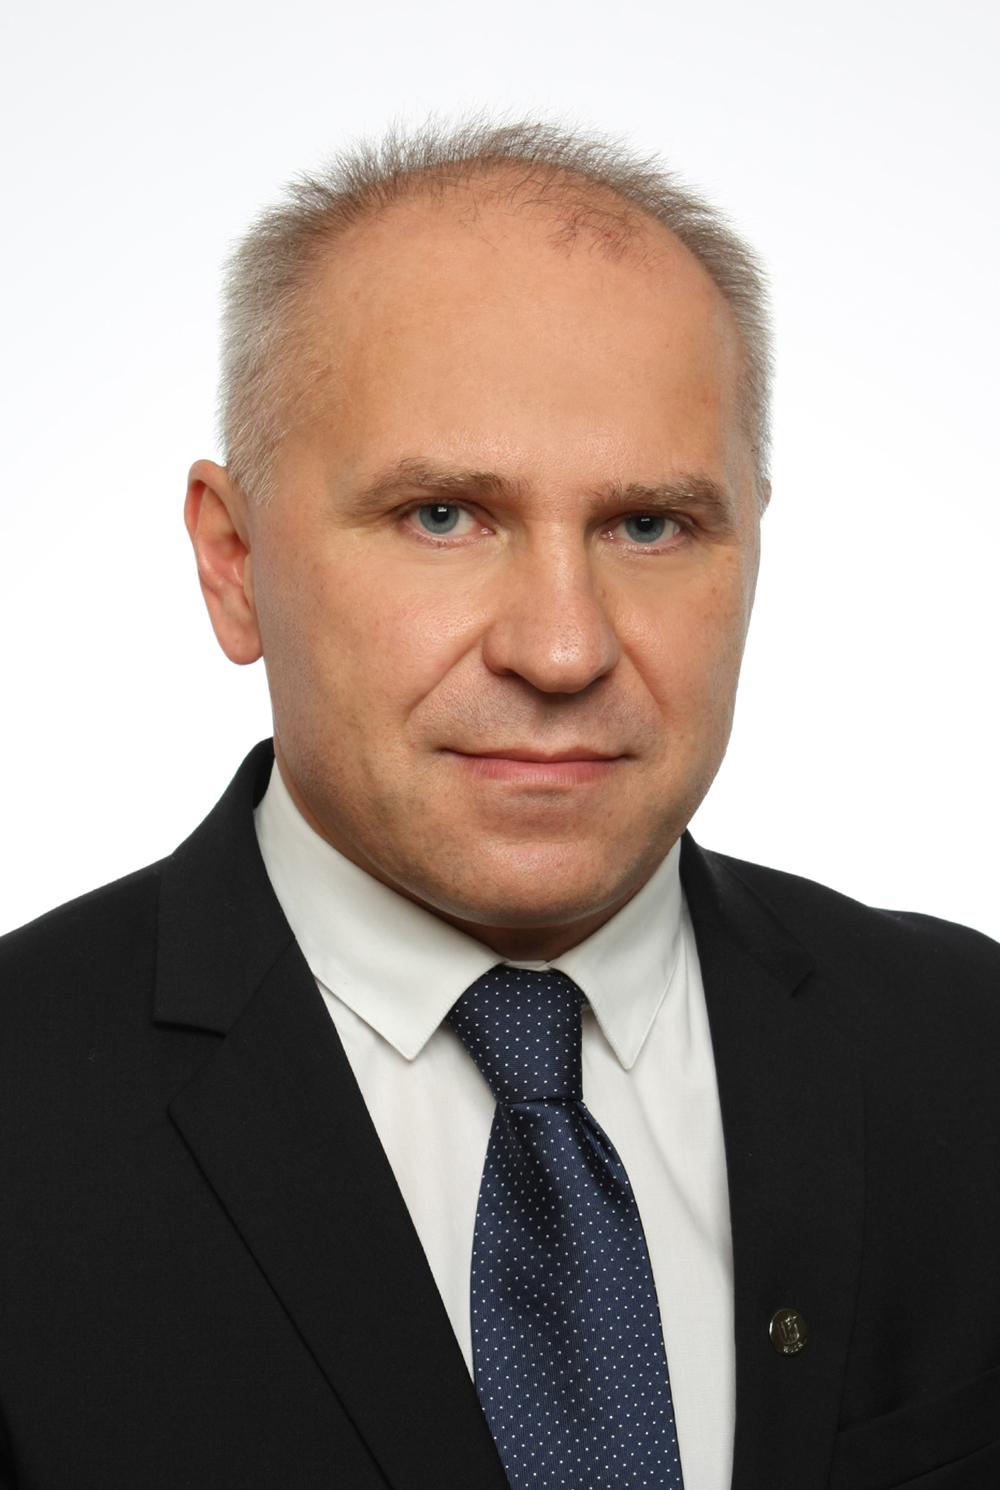 Adam Roczek EUSA President